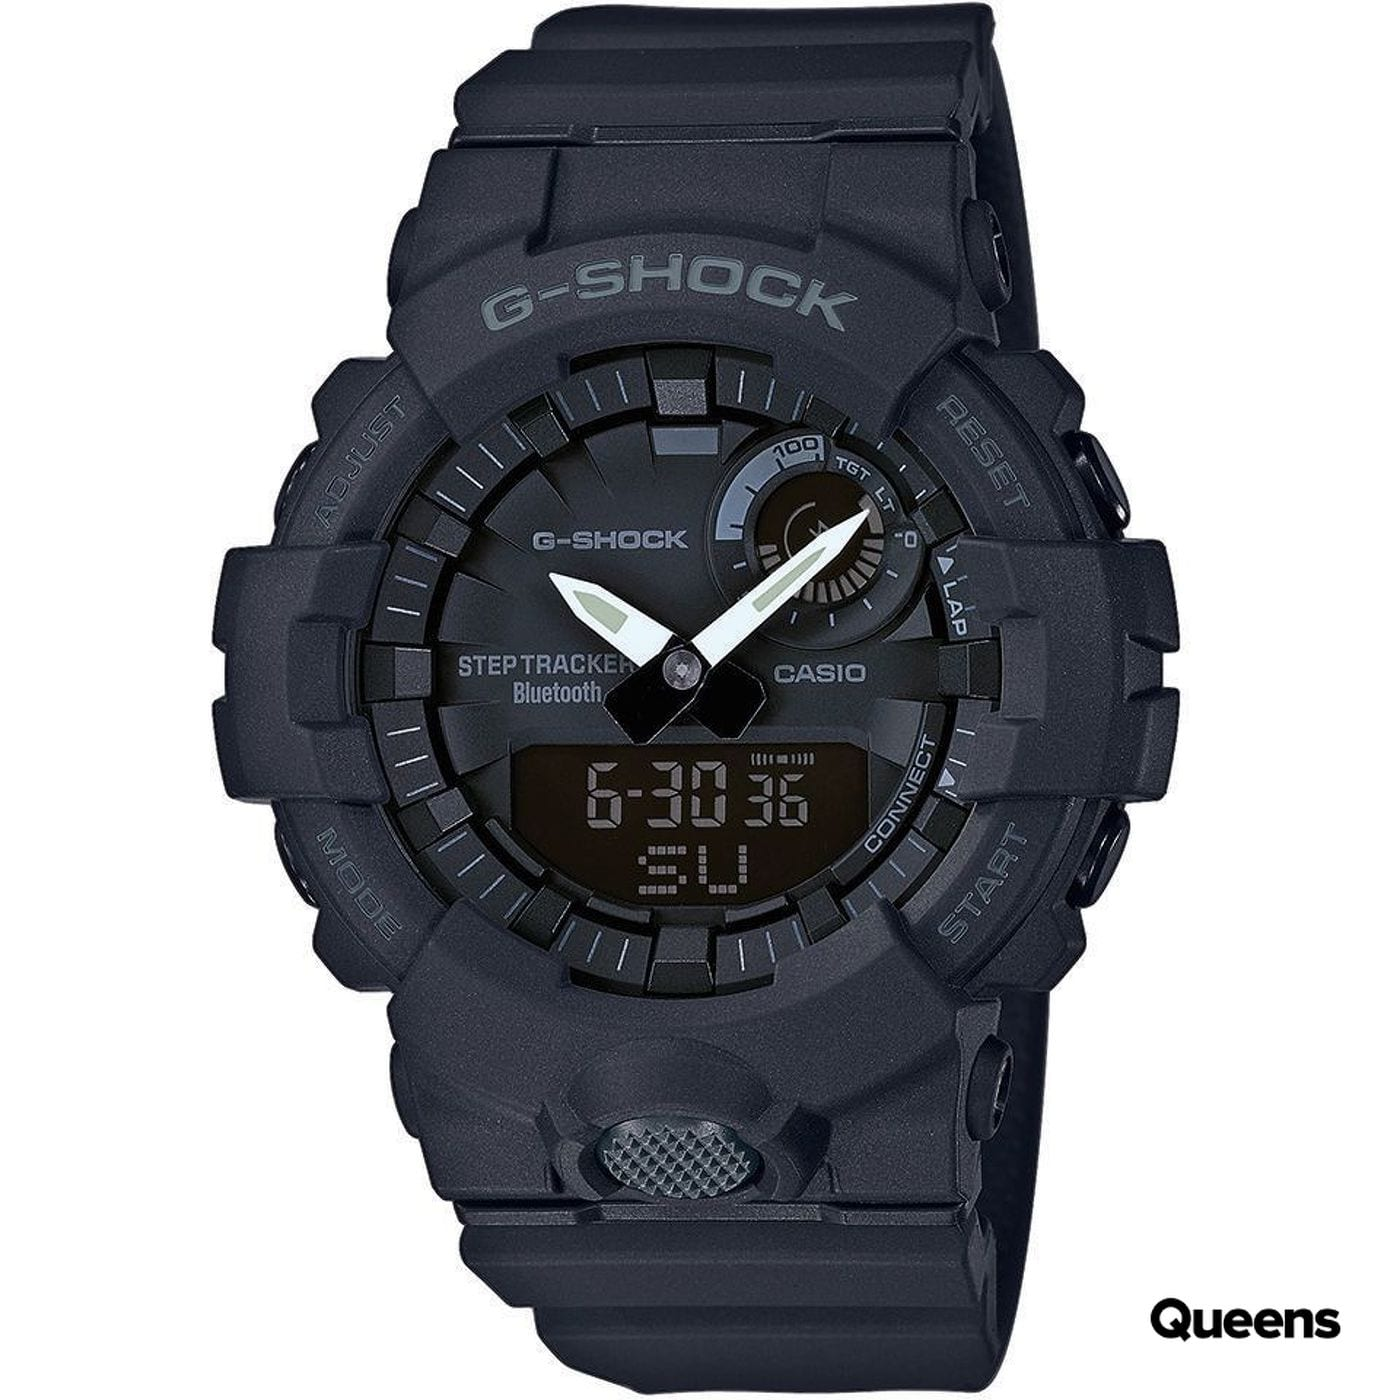 Casio G-Shock GBA 800-1AER schwarz